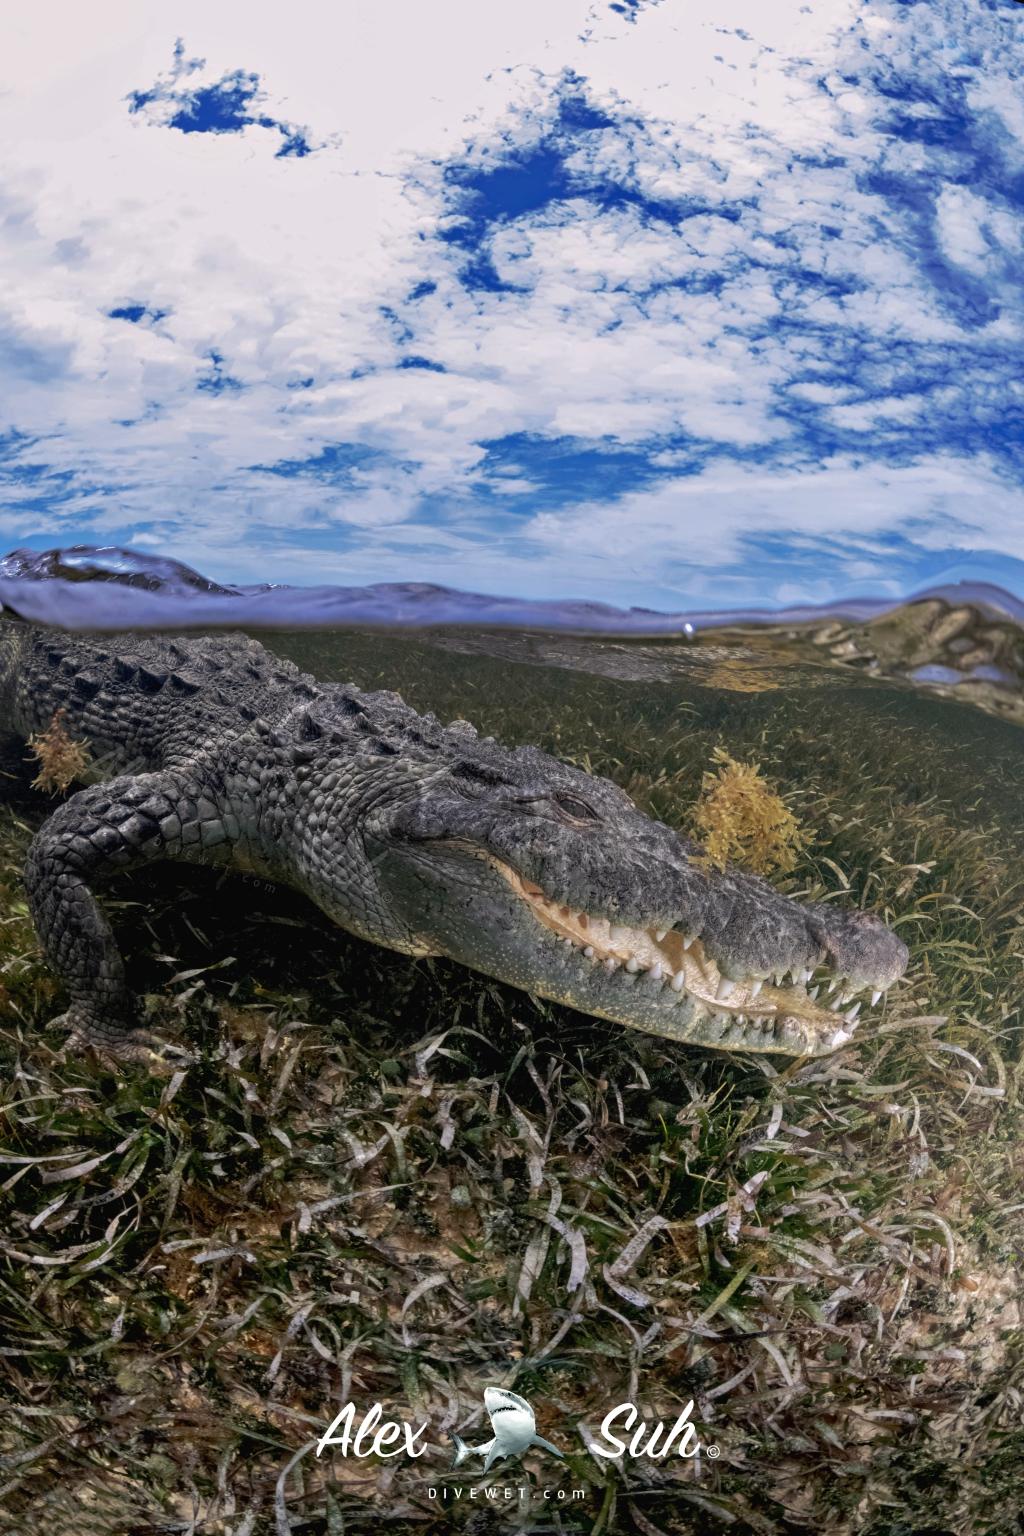 MARKED Croc OU 72dpi.jpg